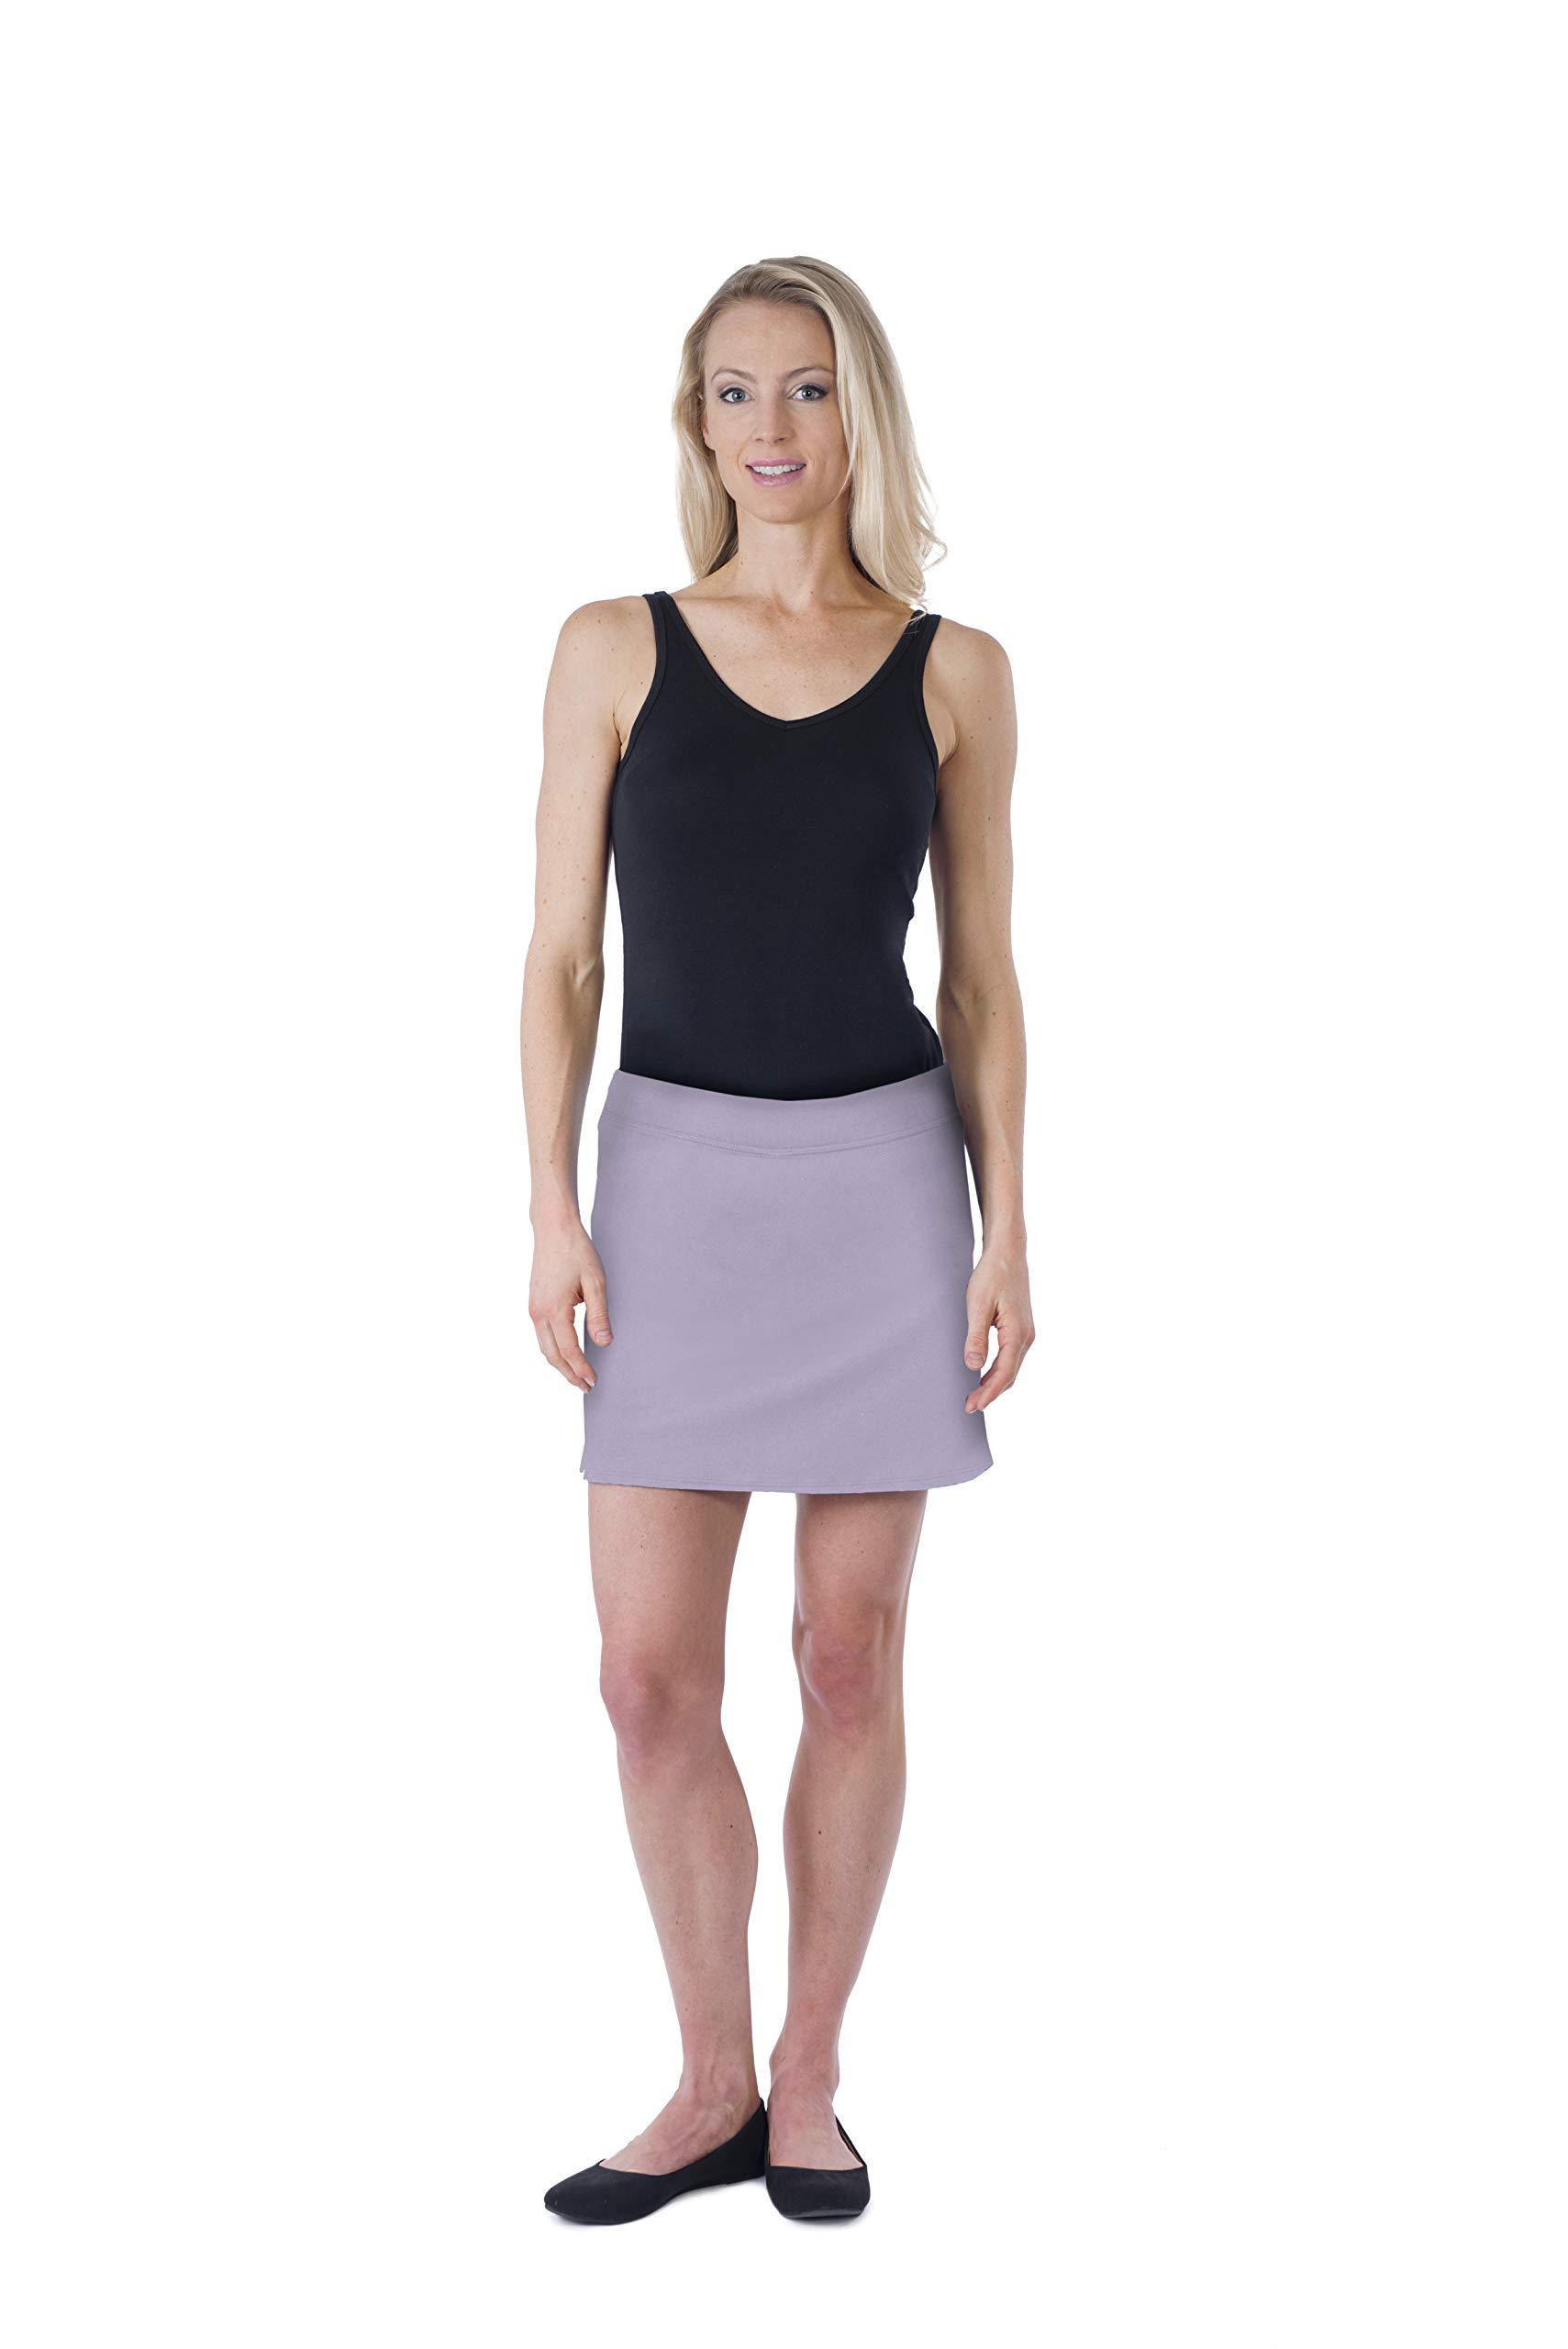 Colorado Clothing Women's Everyday Skort (Iris, Medium) by Colorado Clothing